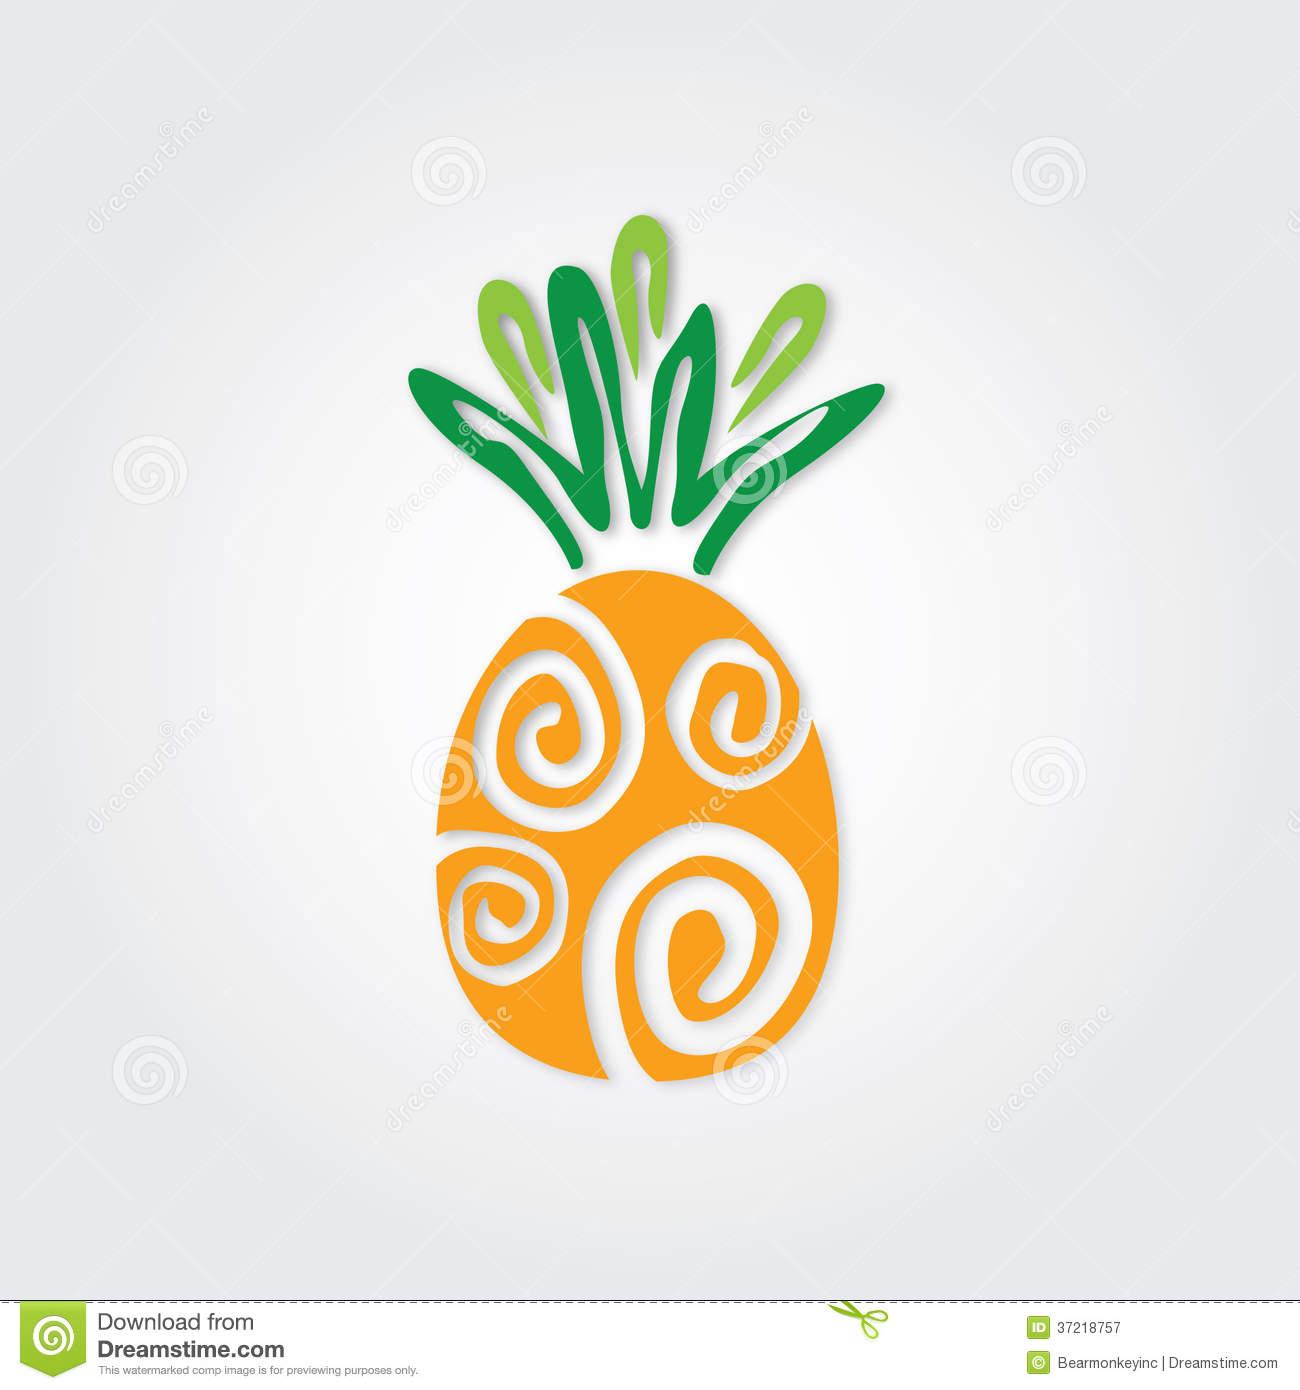 Free Pineapple Graphics